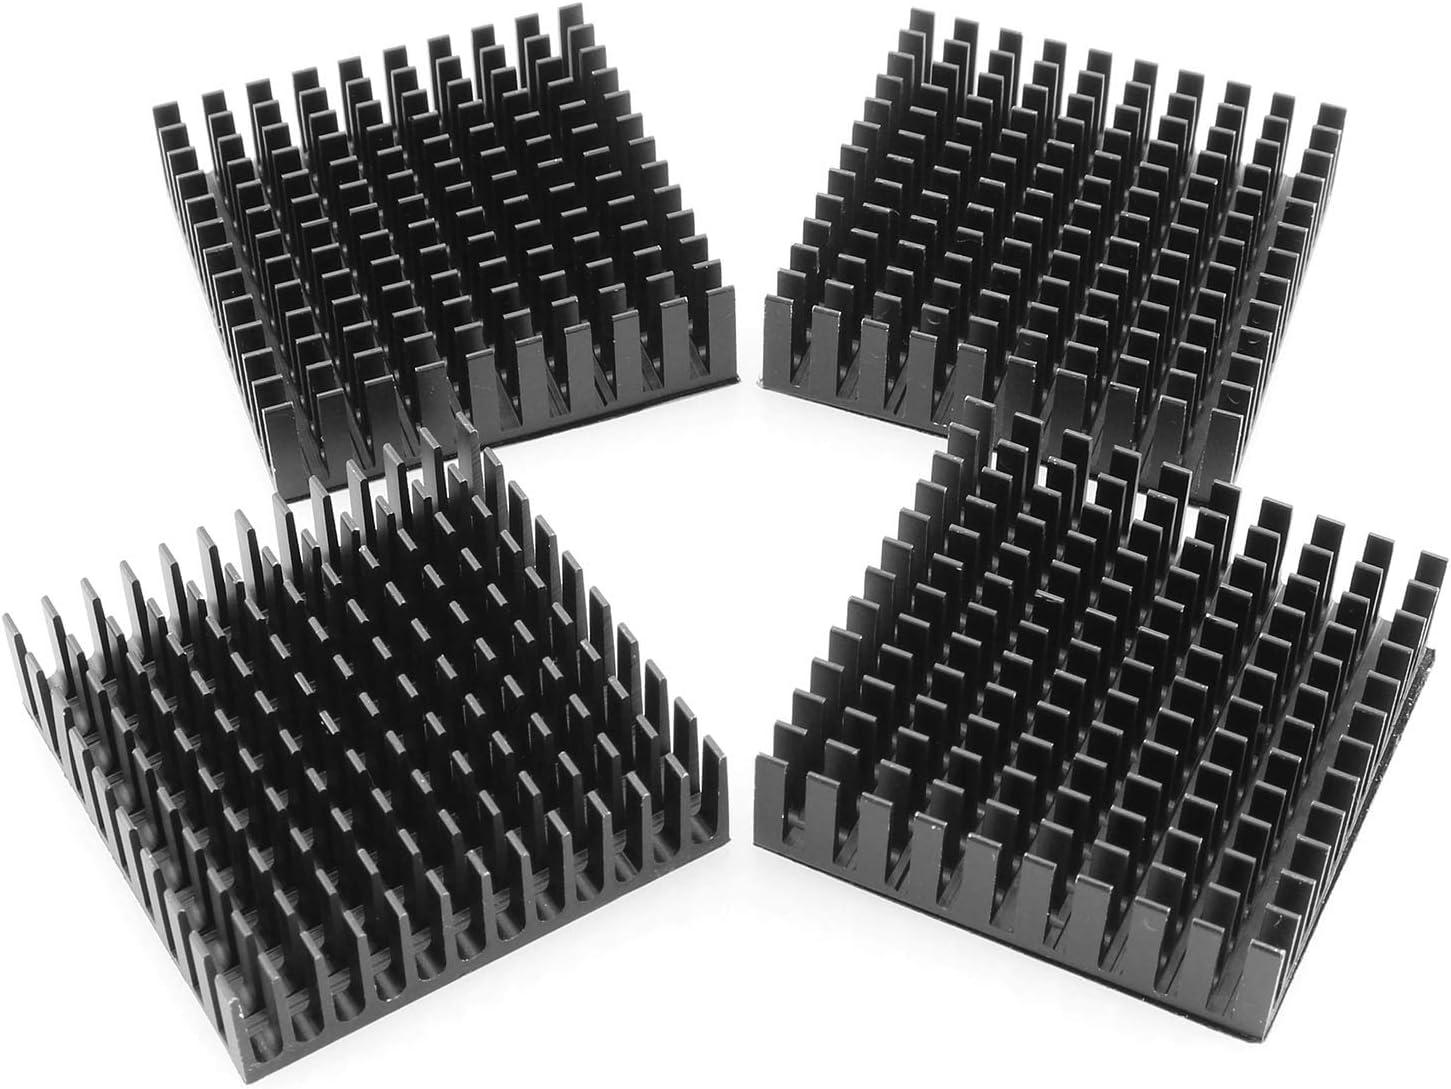 DGZZI Aluminum Heatsink 4PCS 40x40x11mm Black Aluminum Cooling Fin Radiator with 3M Thermal Conductive Adhesive Tape for Cooling GPU IC Chips VRAM VGA RAM